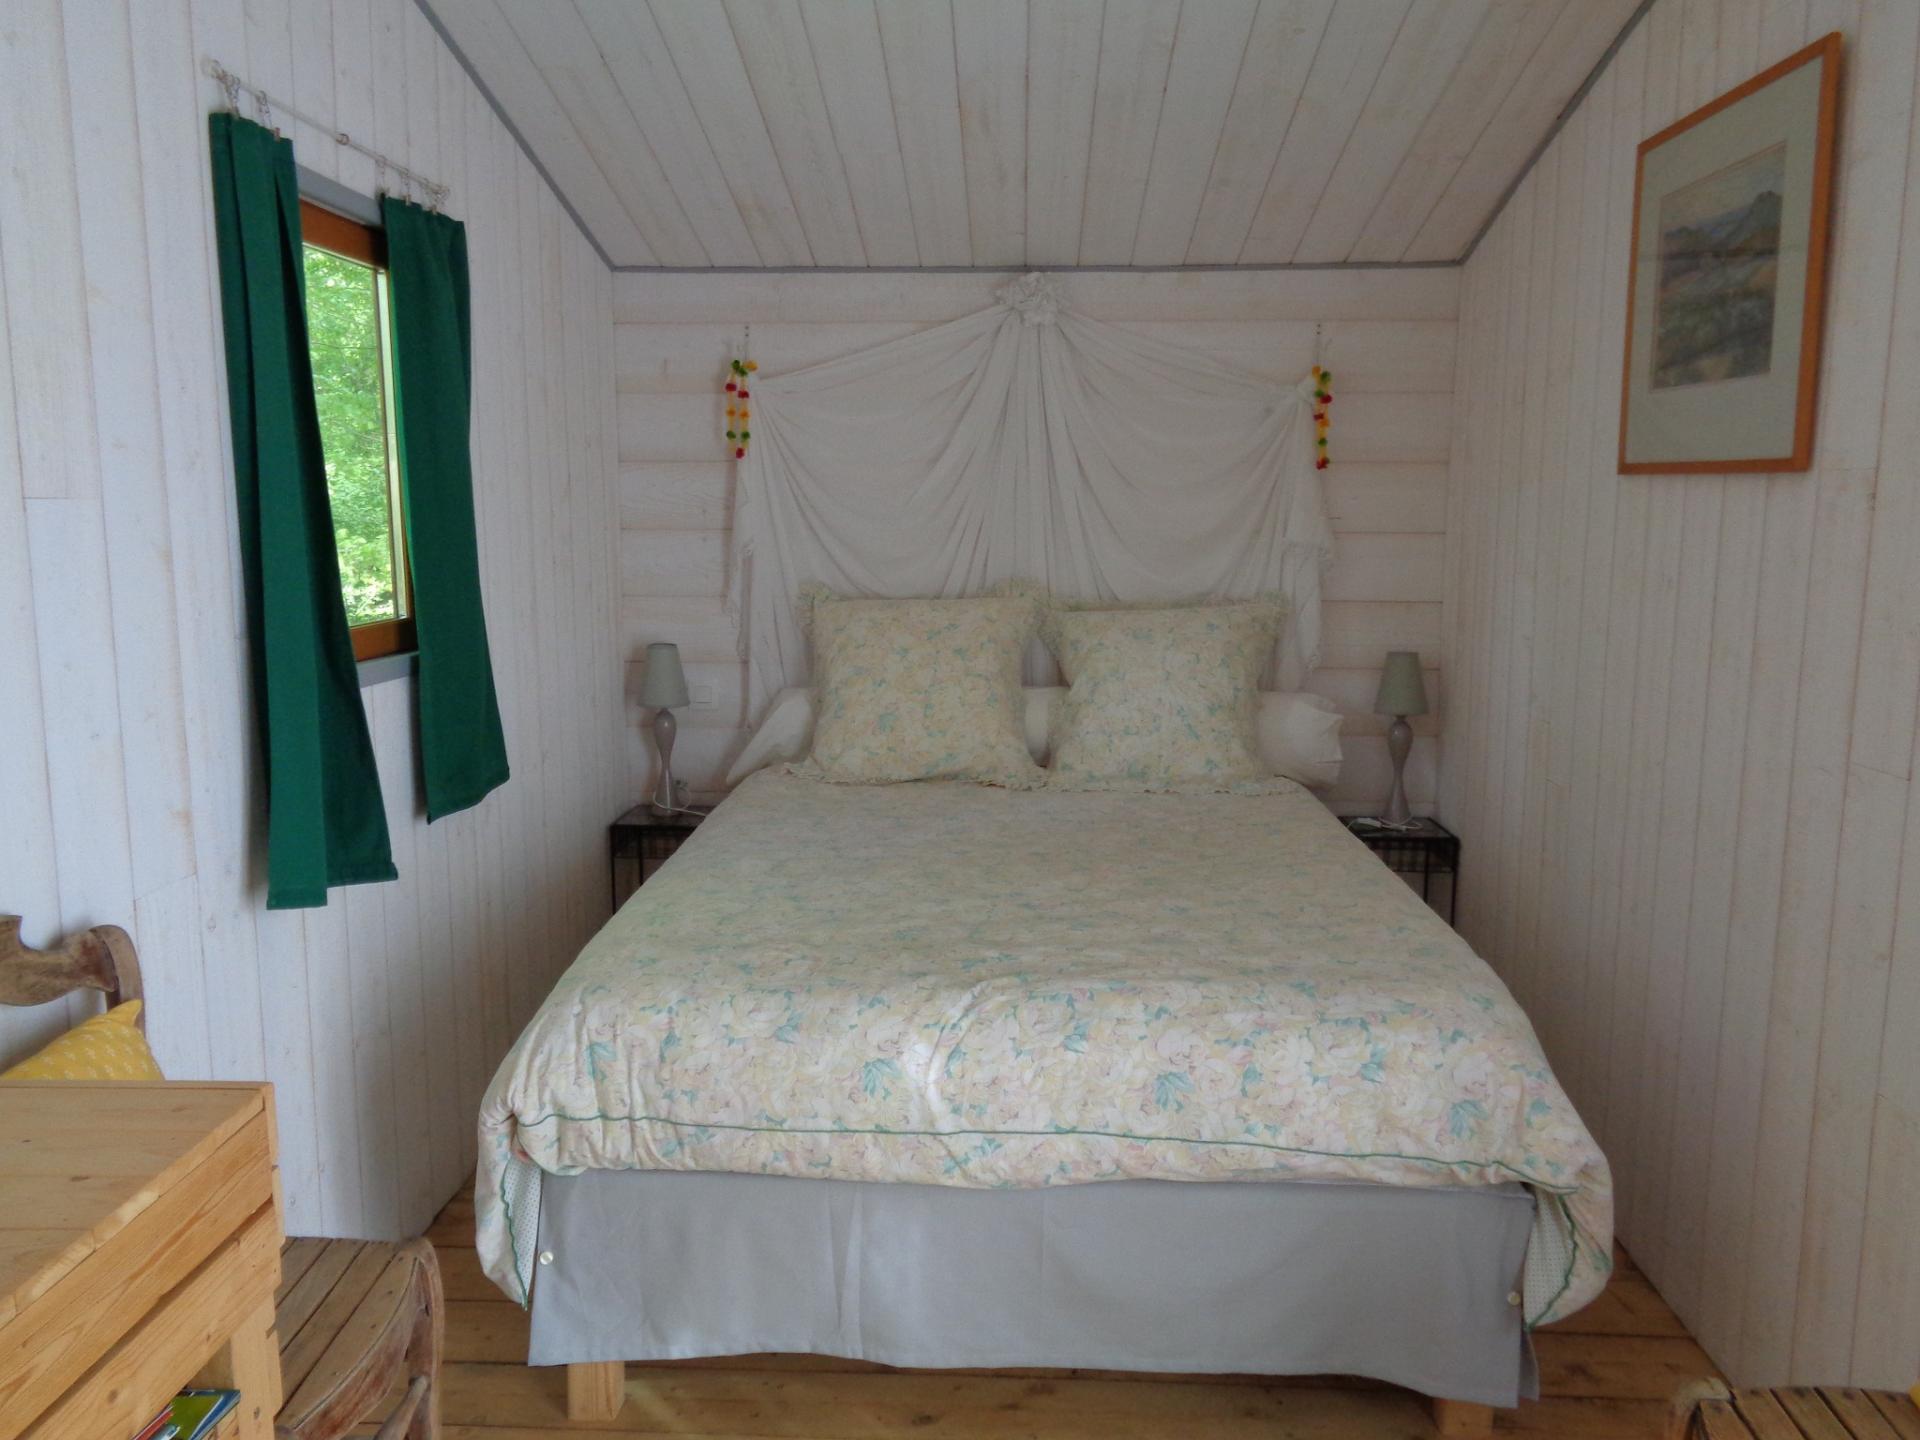 chambre chalet blanc vert